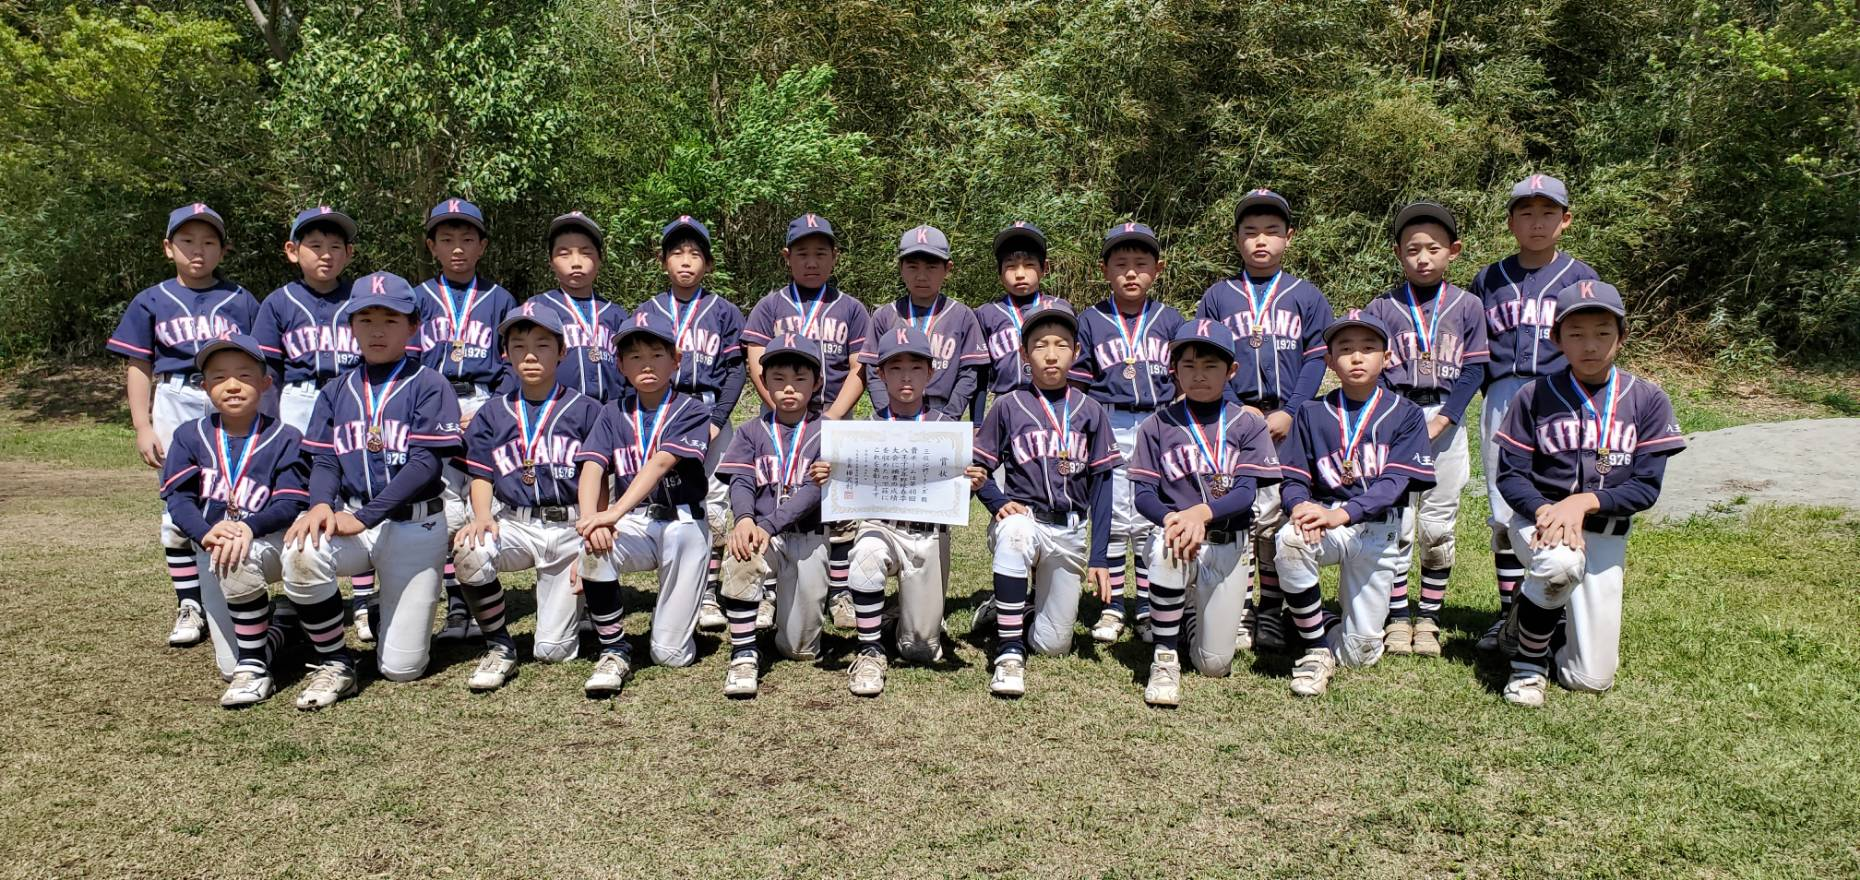 第46回少年軟式野球・春季大会 第三位 北野バイオレンズ 令和3年4月18日